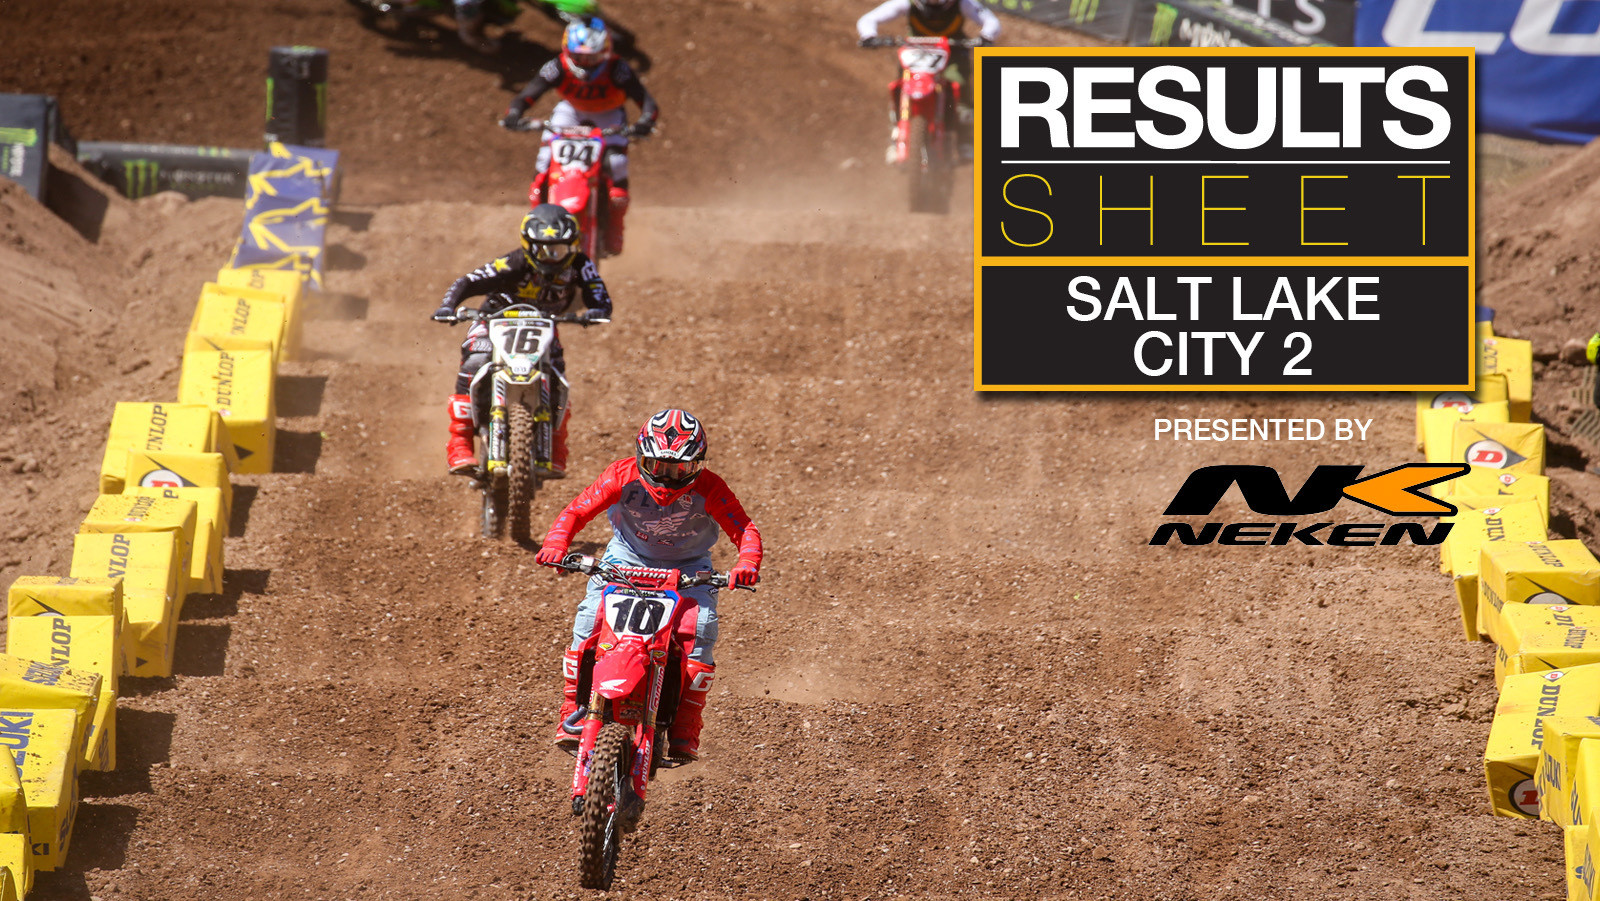 Results Sheet: 2020 Salt Lake City 2 Supercross